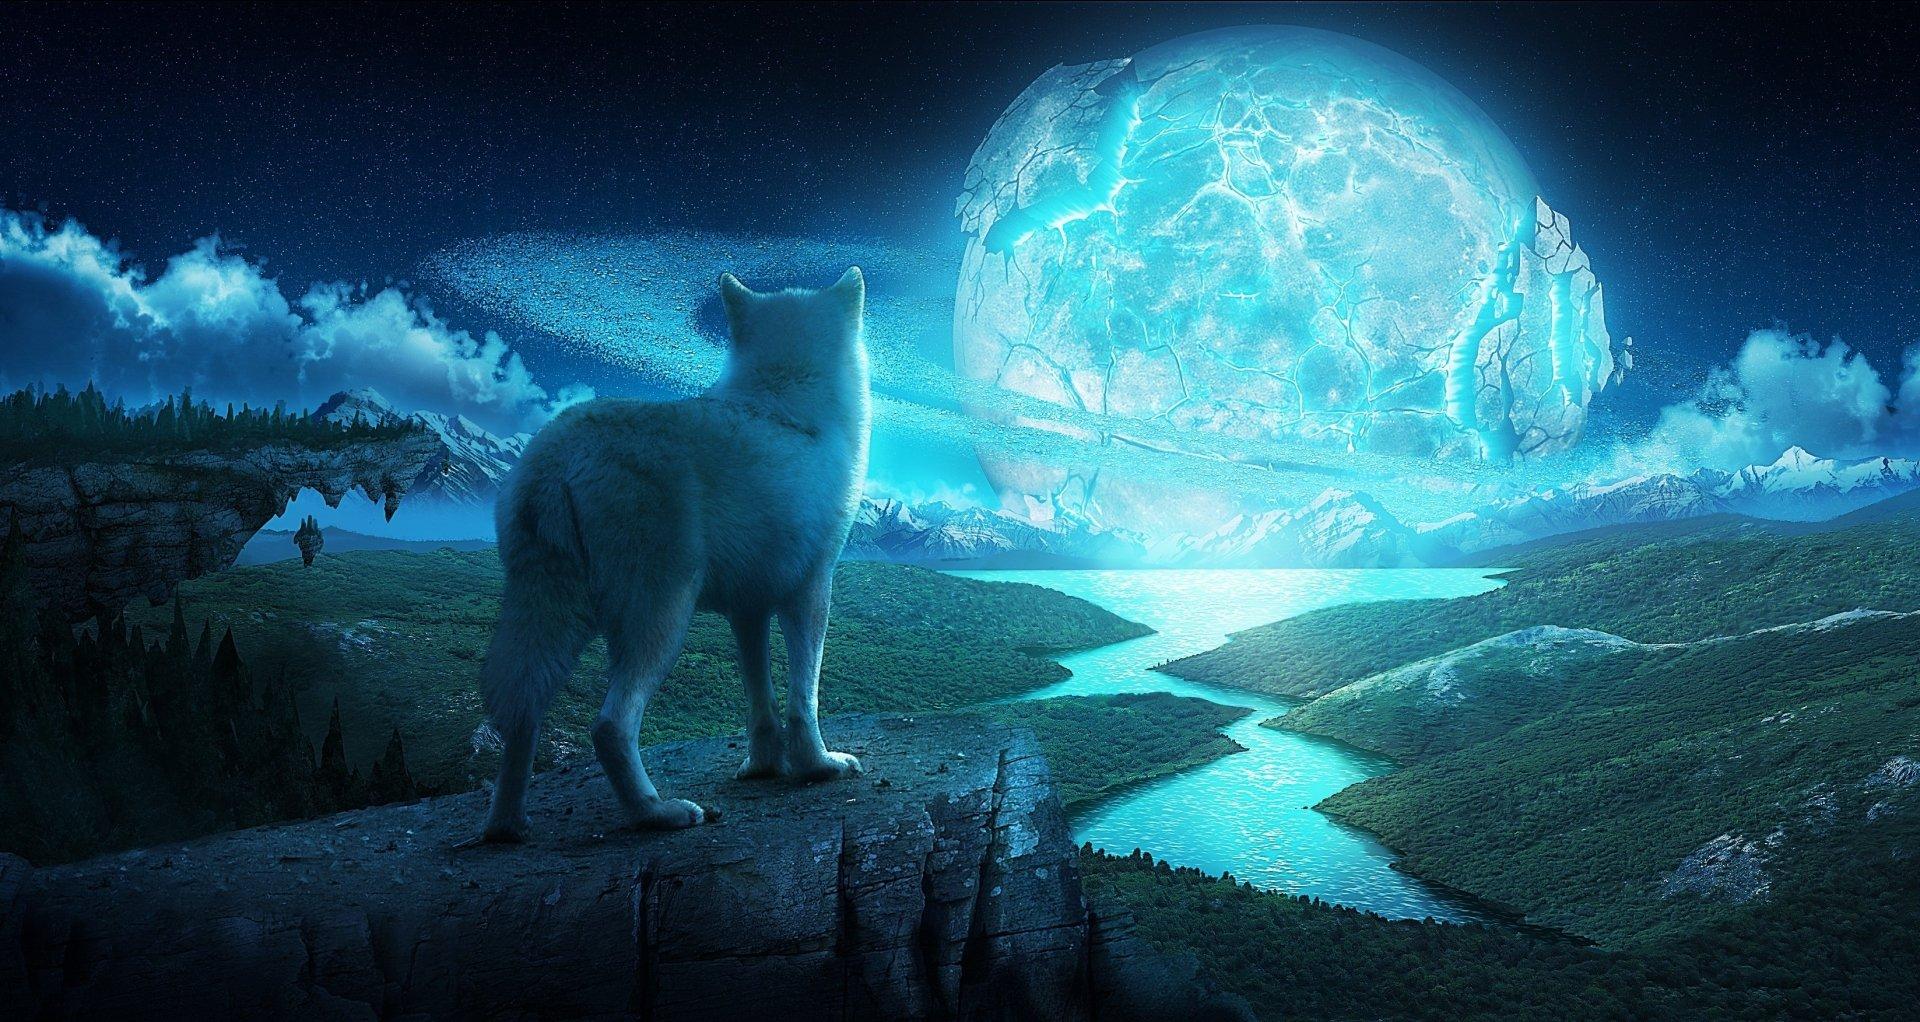 Animal - Wolf  Landscape River Magical Sun Planetscape Fantasy Wallpaper